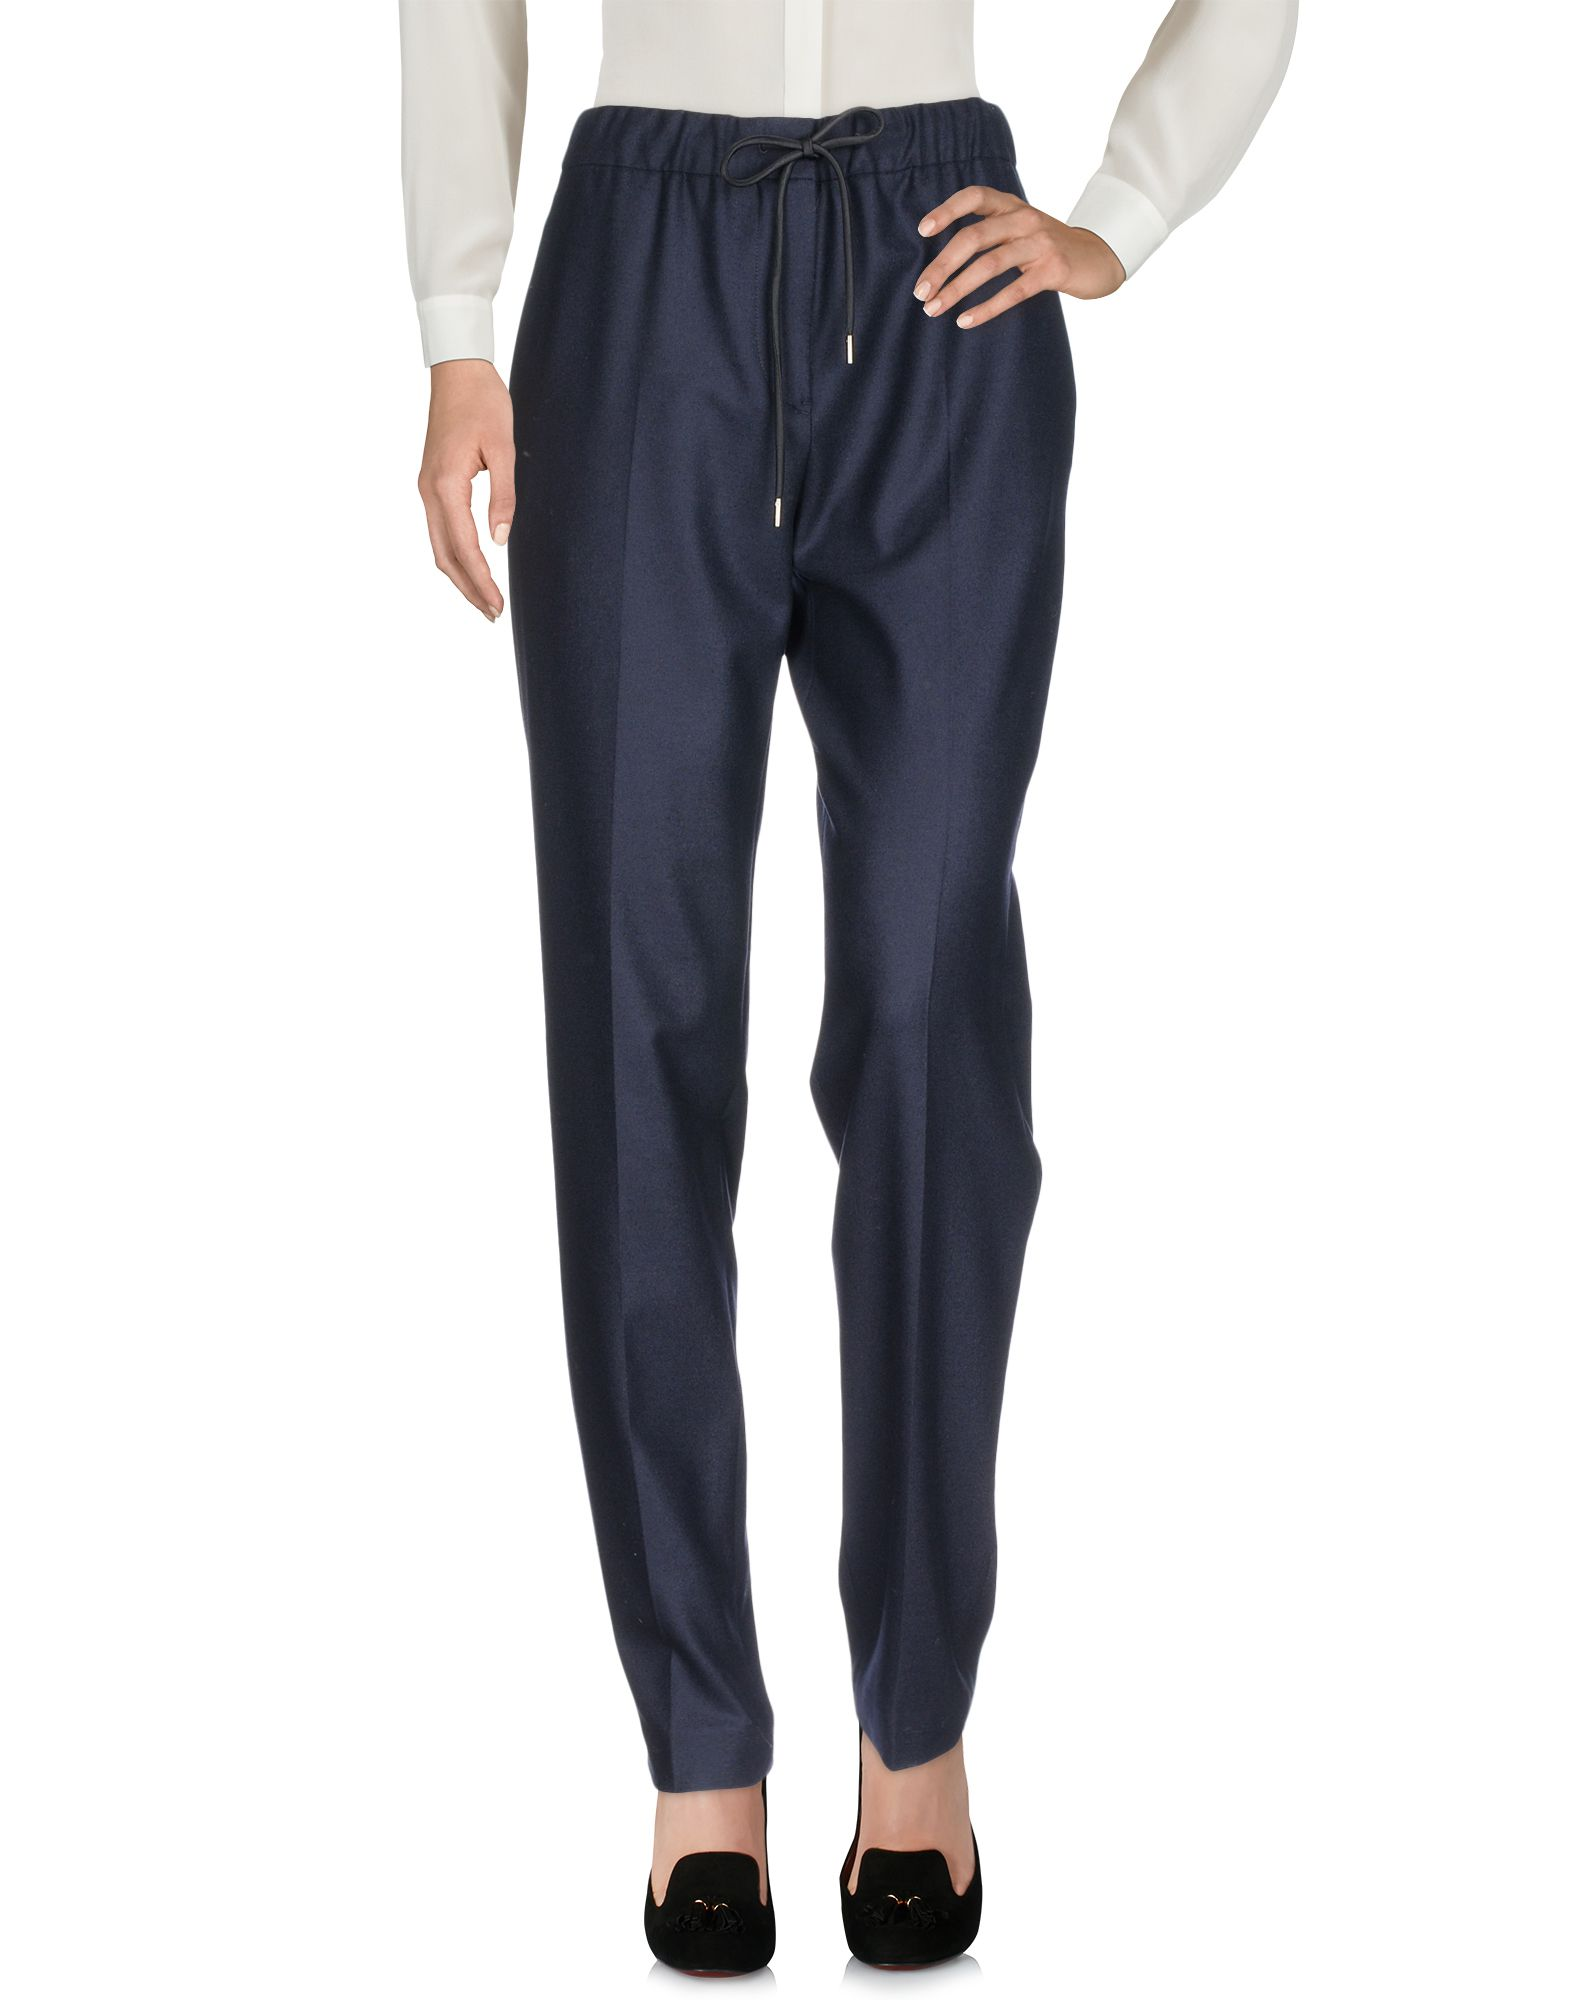 Pantalone Jil Sander Donna - Acquista online su YzgqWJJO